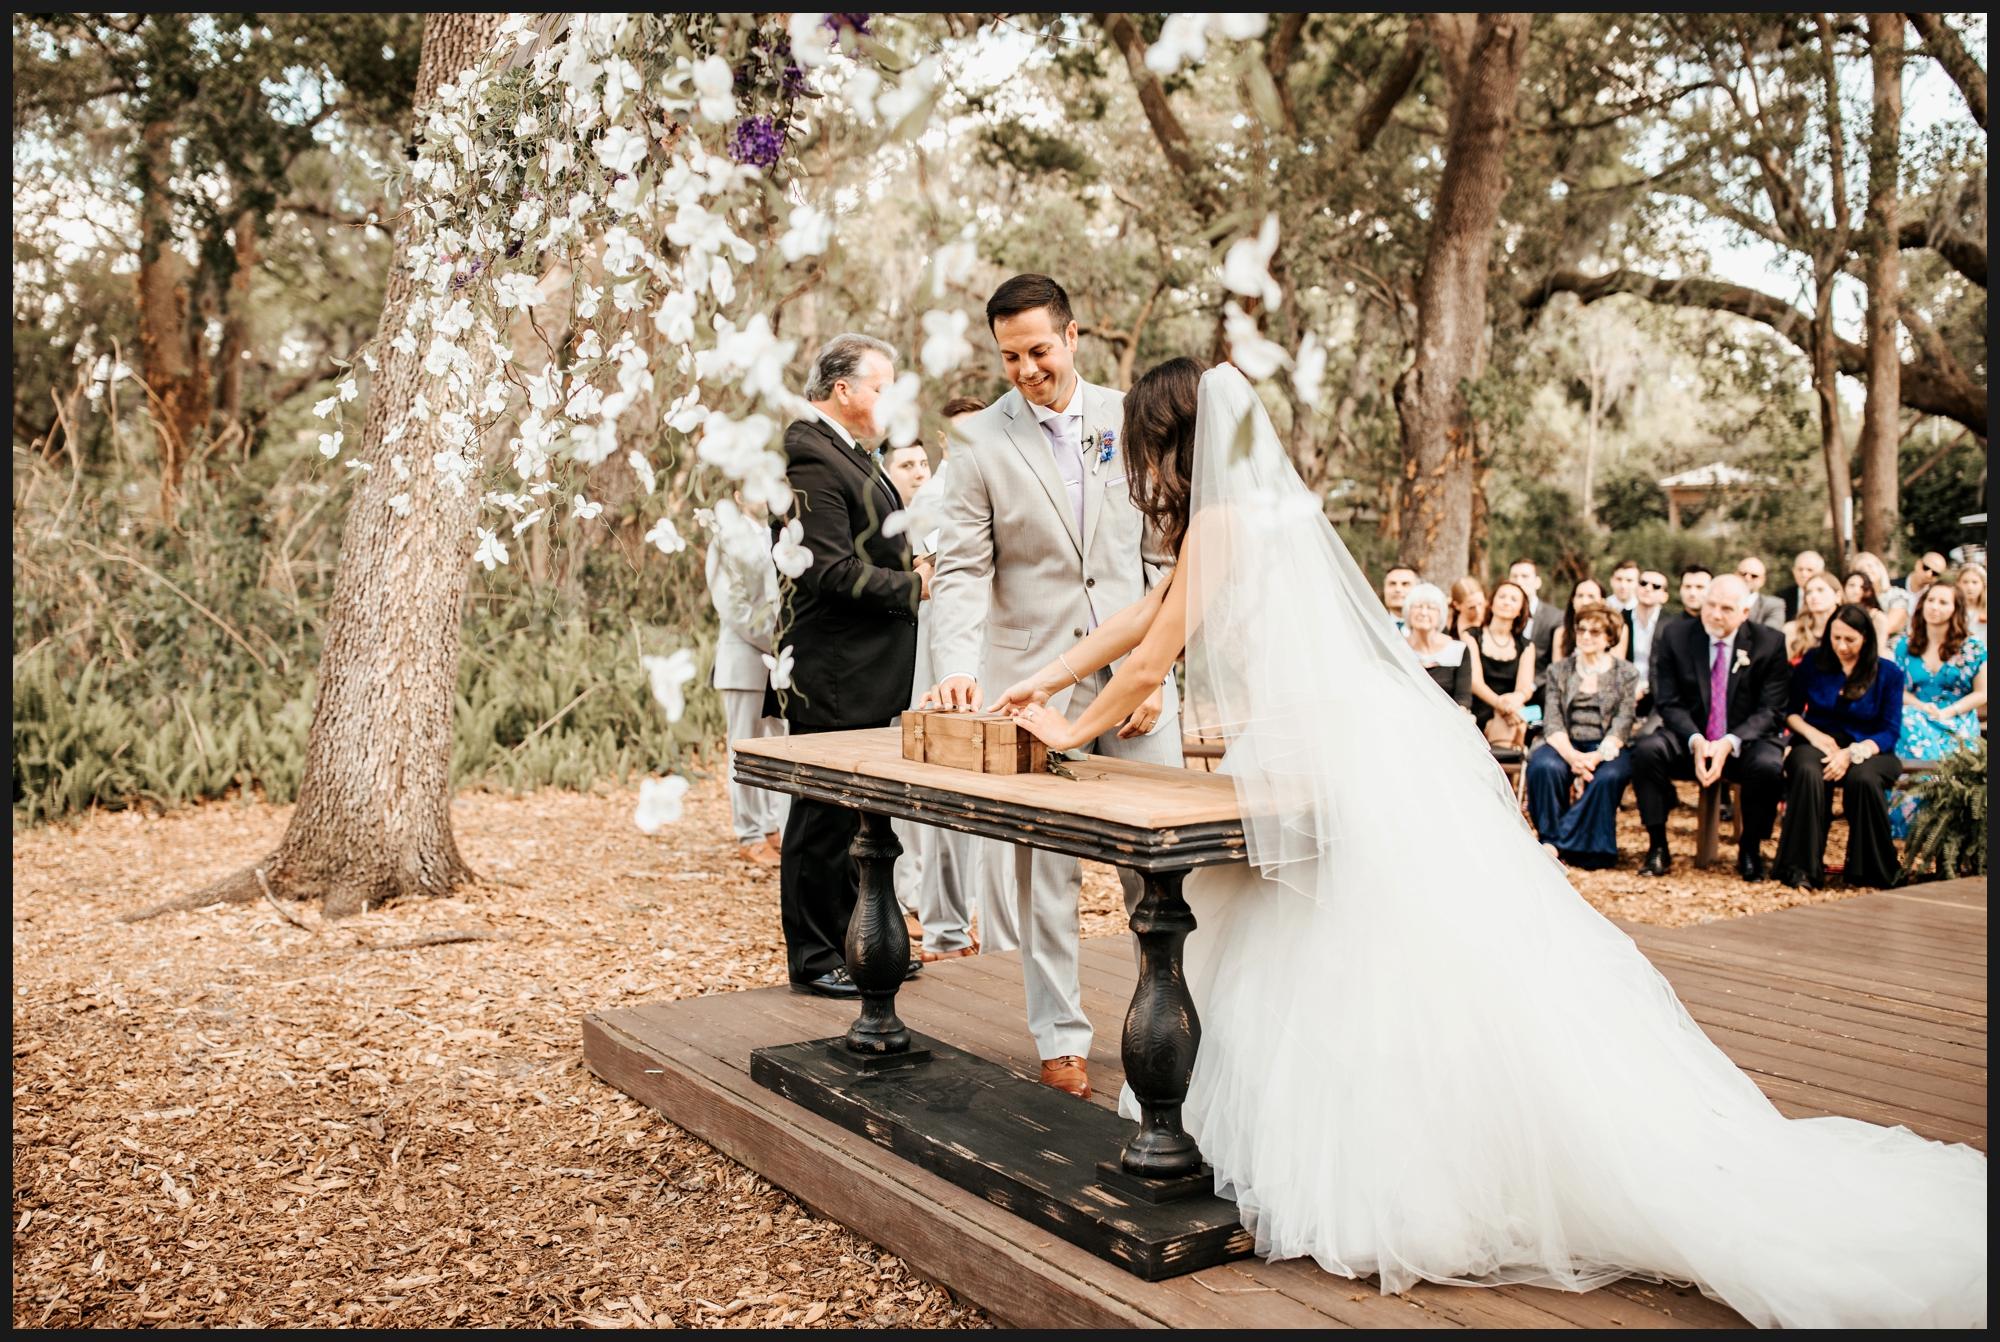 Orlando-Wedding-Photographer-destination-wedding-photographer-florida-wedding-photographer-bohemian-wedding-photographer_1614.jpg